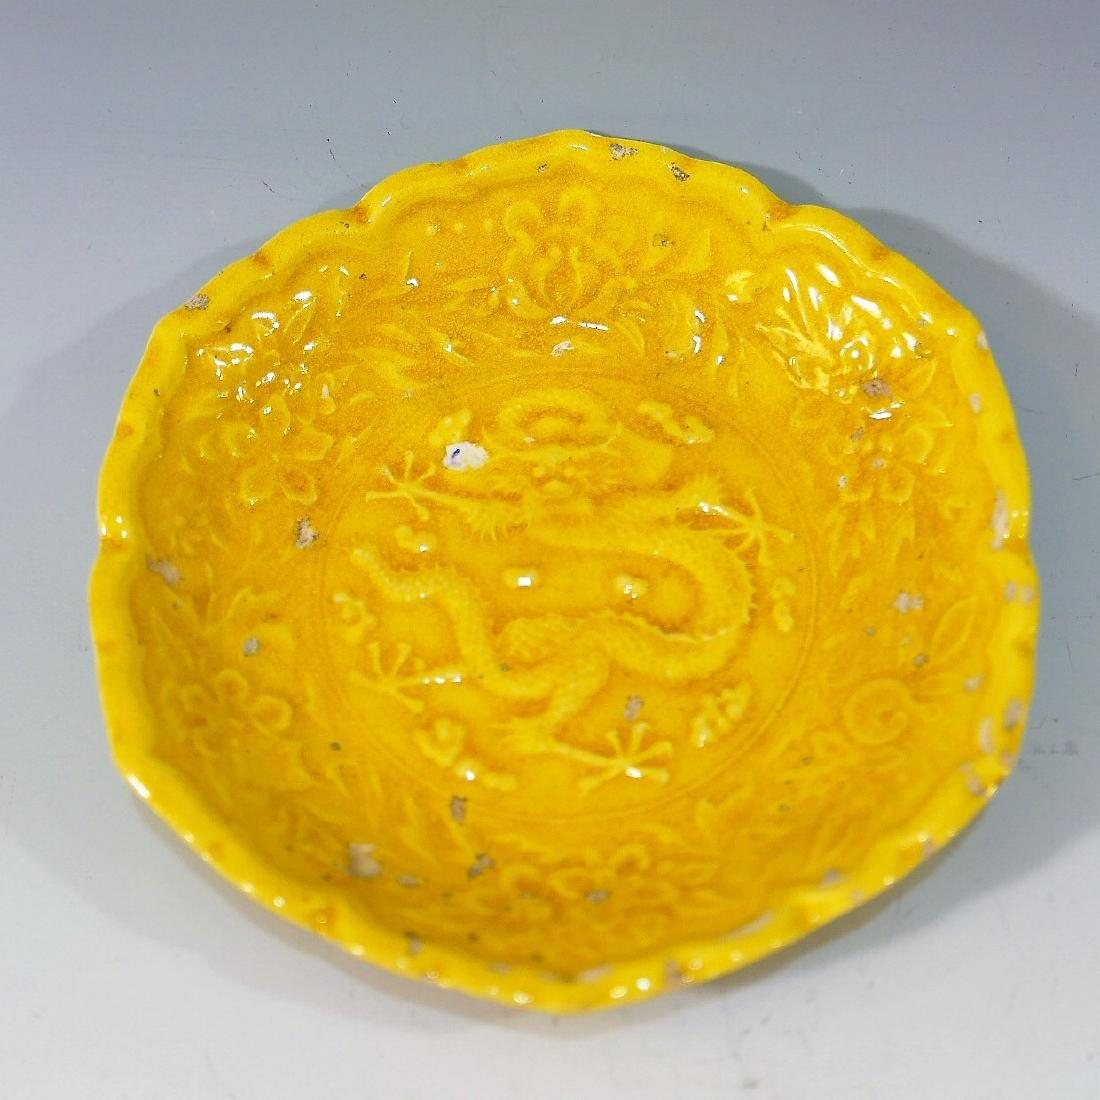 CHINESE ANTIQUE YELLOW GLAZE DISH